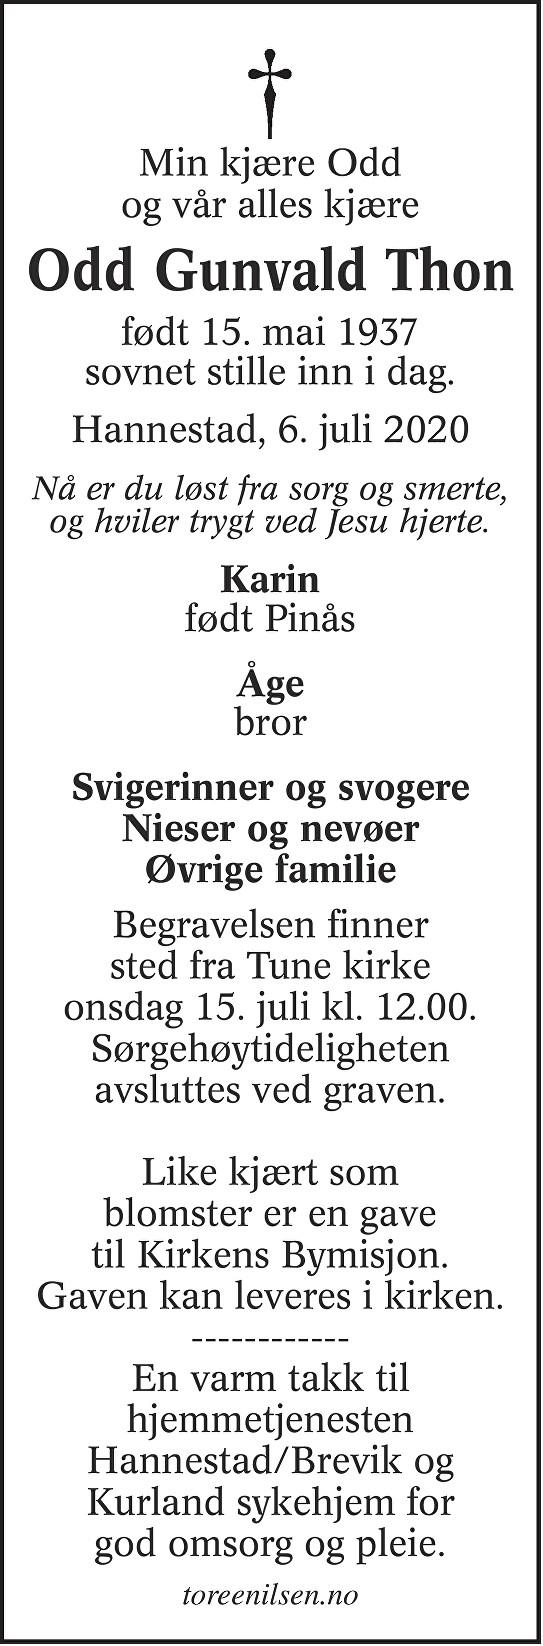 Odd Gunvald Thon Dødsannonse